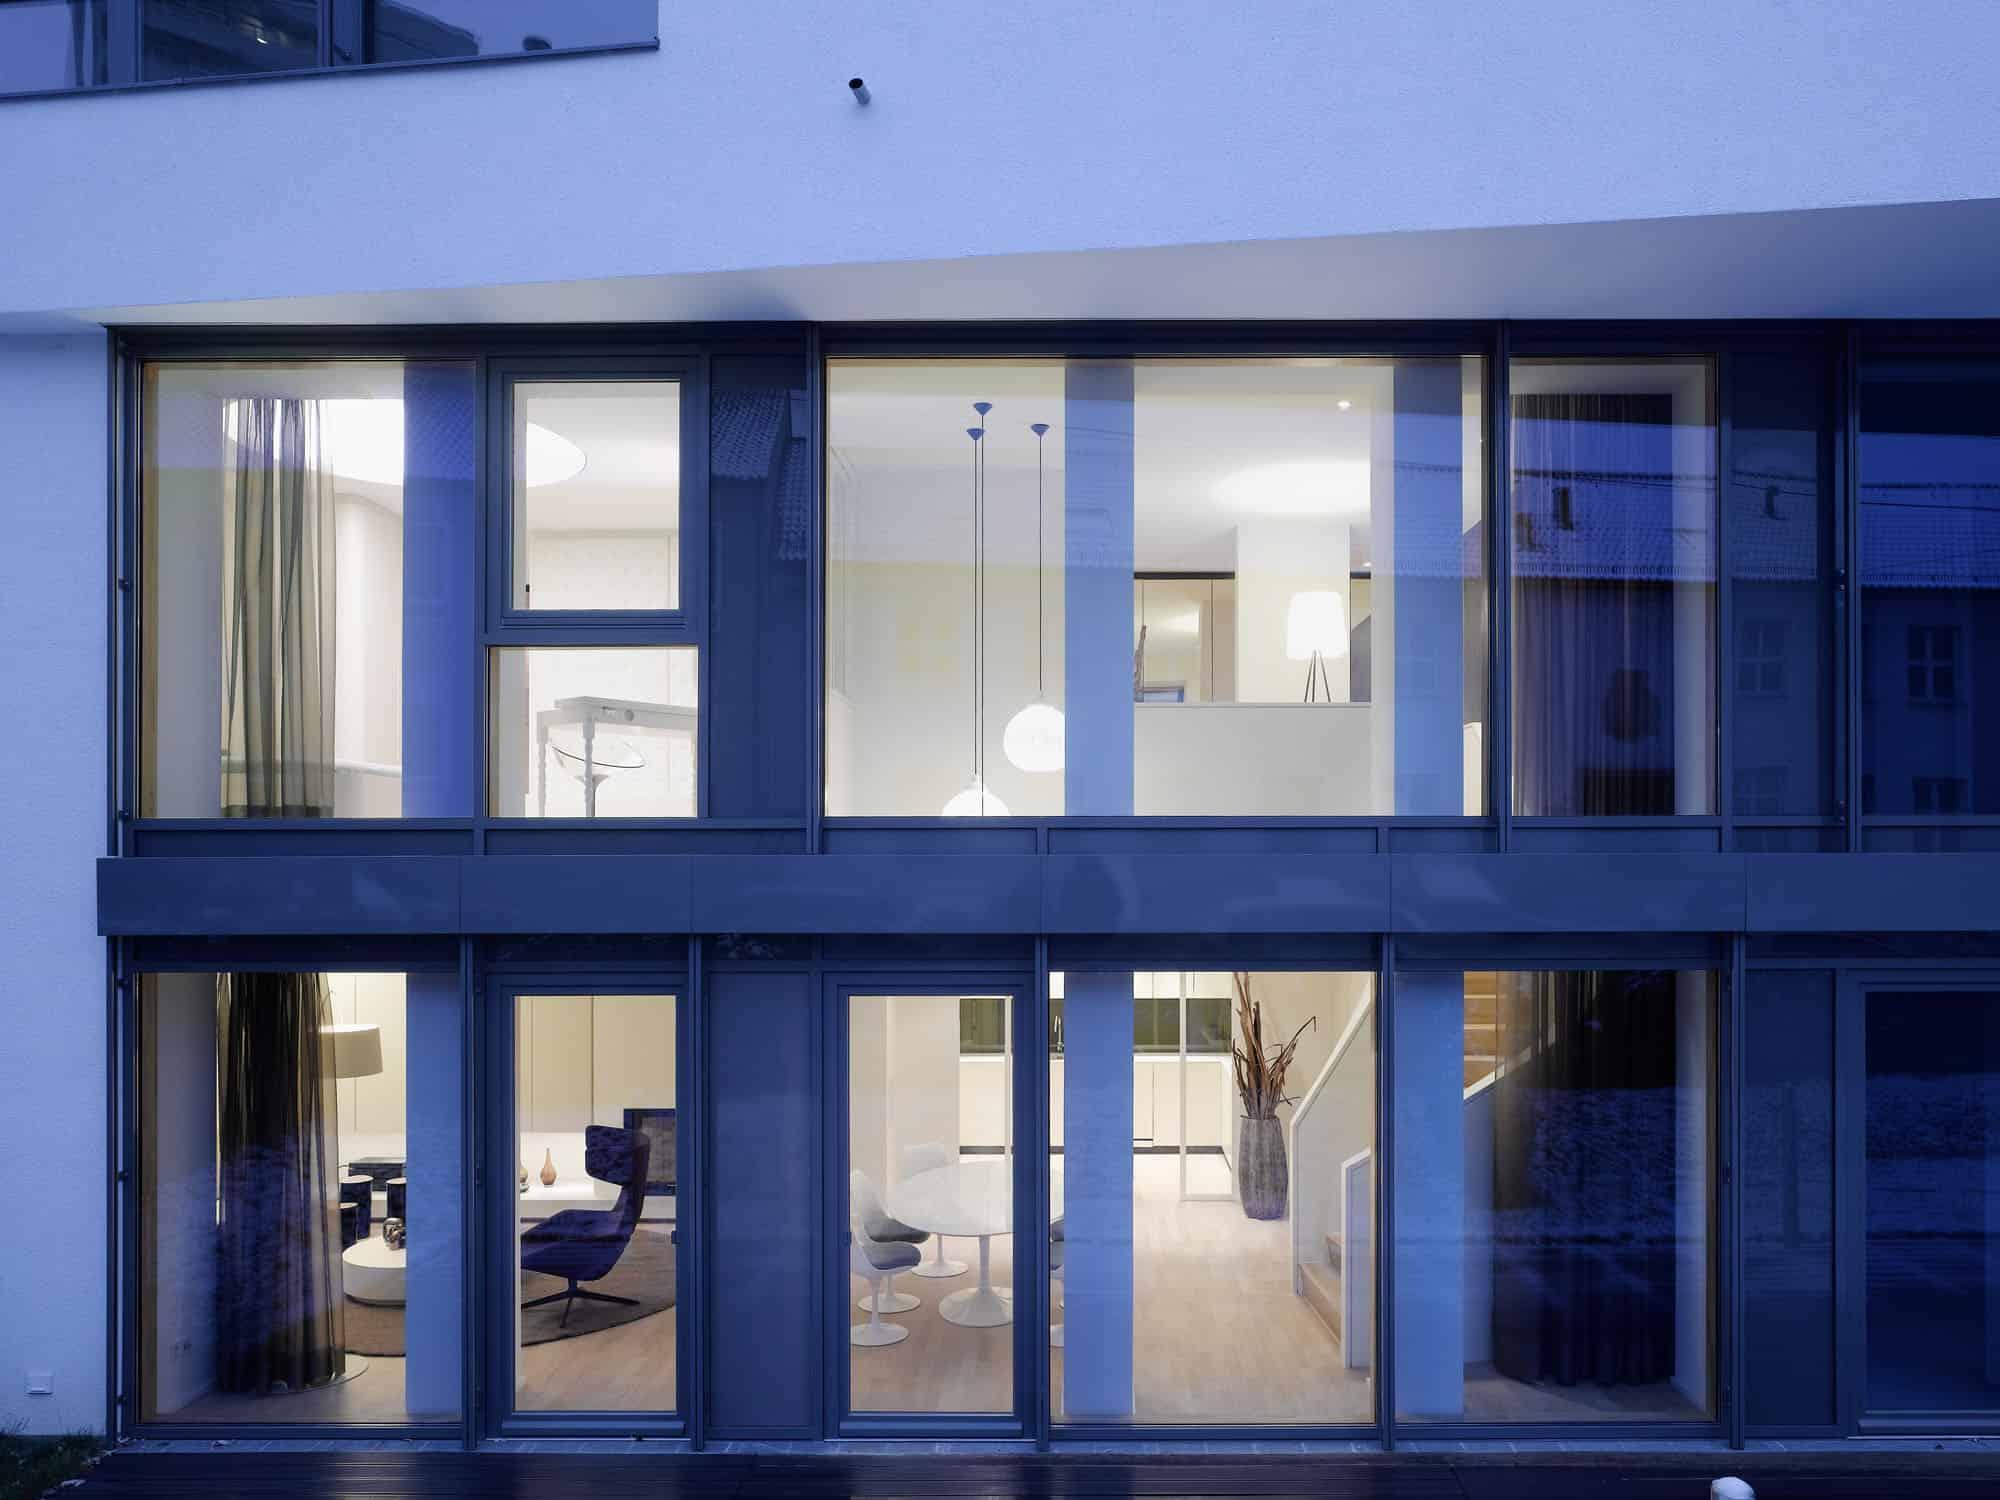 Quant 1 Apartment by Ippolito Fleitz Group (1)